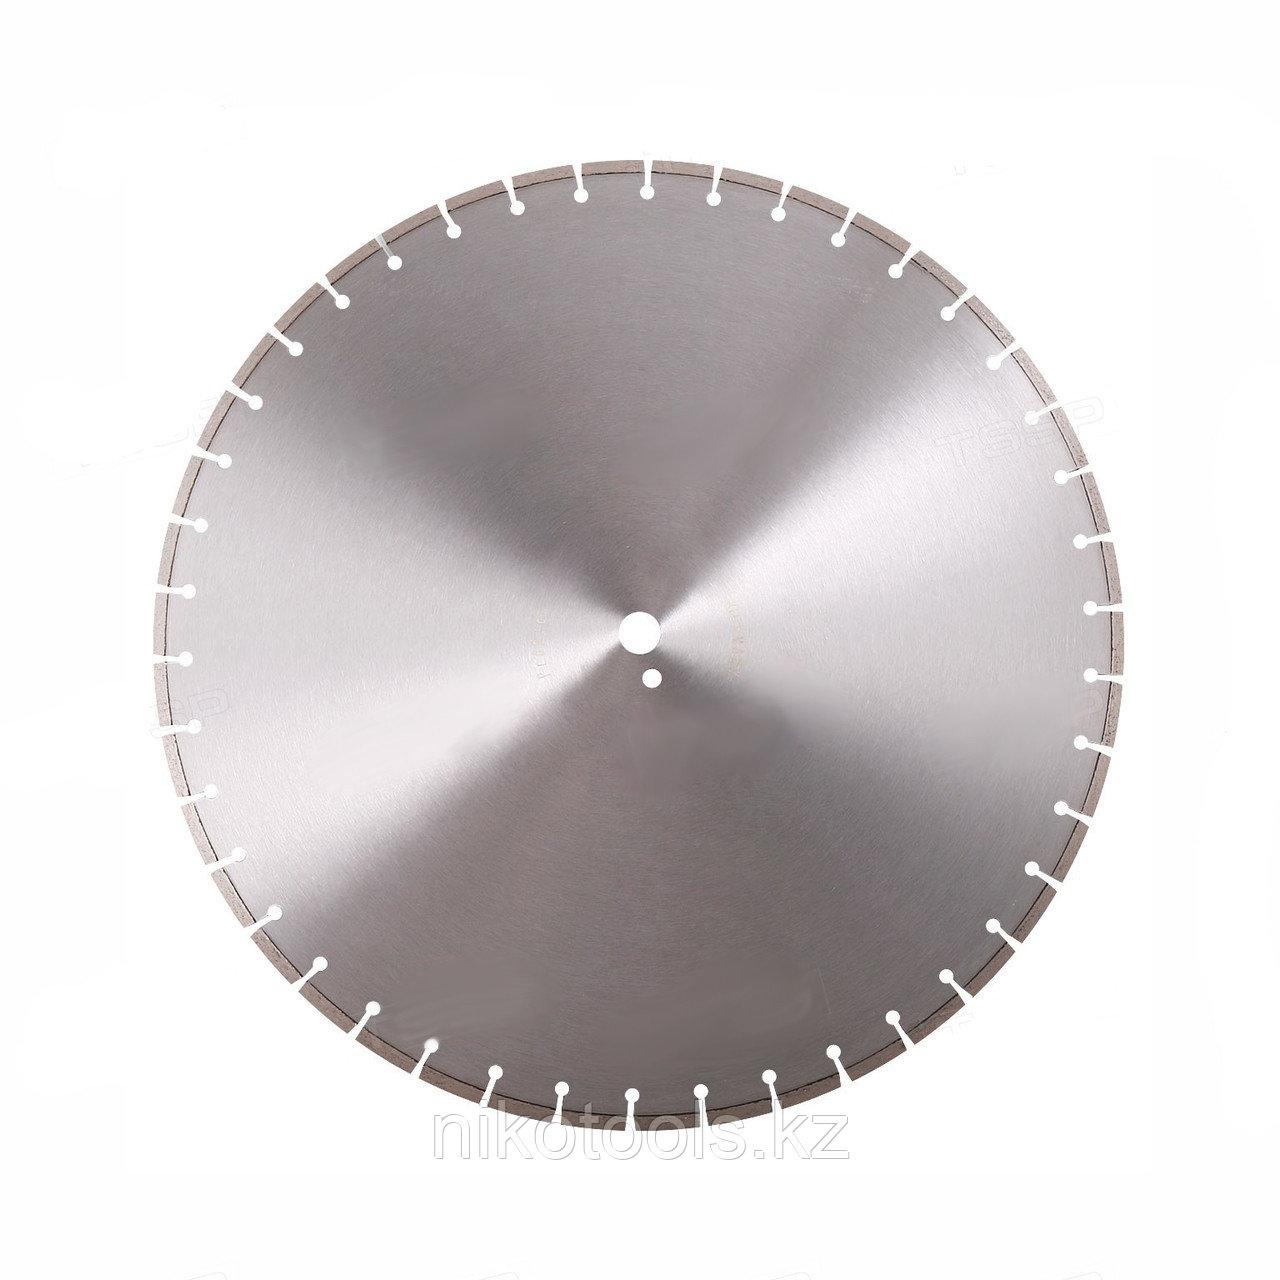 Диск резчик стен WC 6210 ALTECO Professional 1000 mm